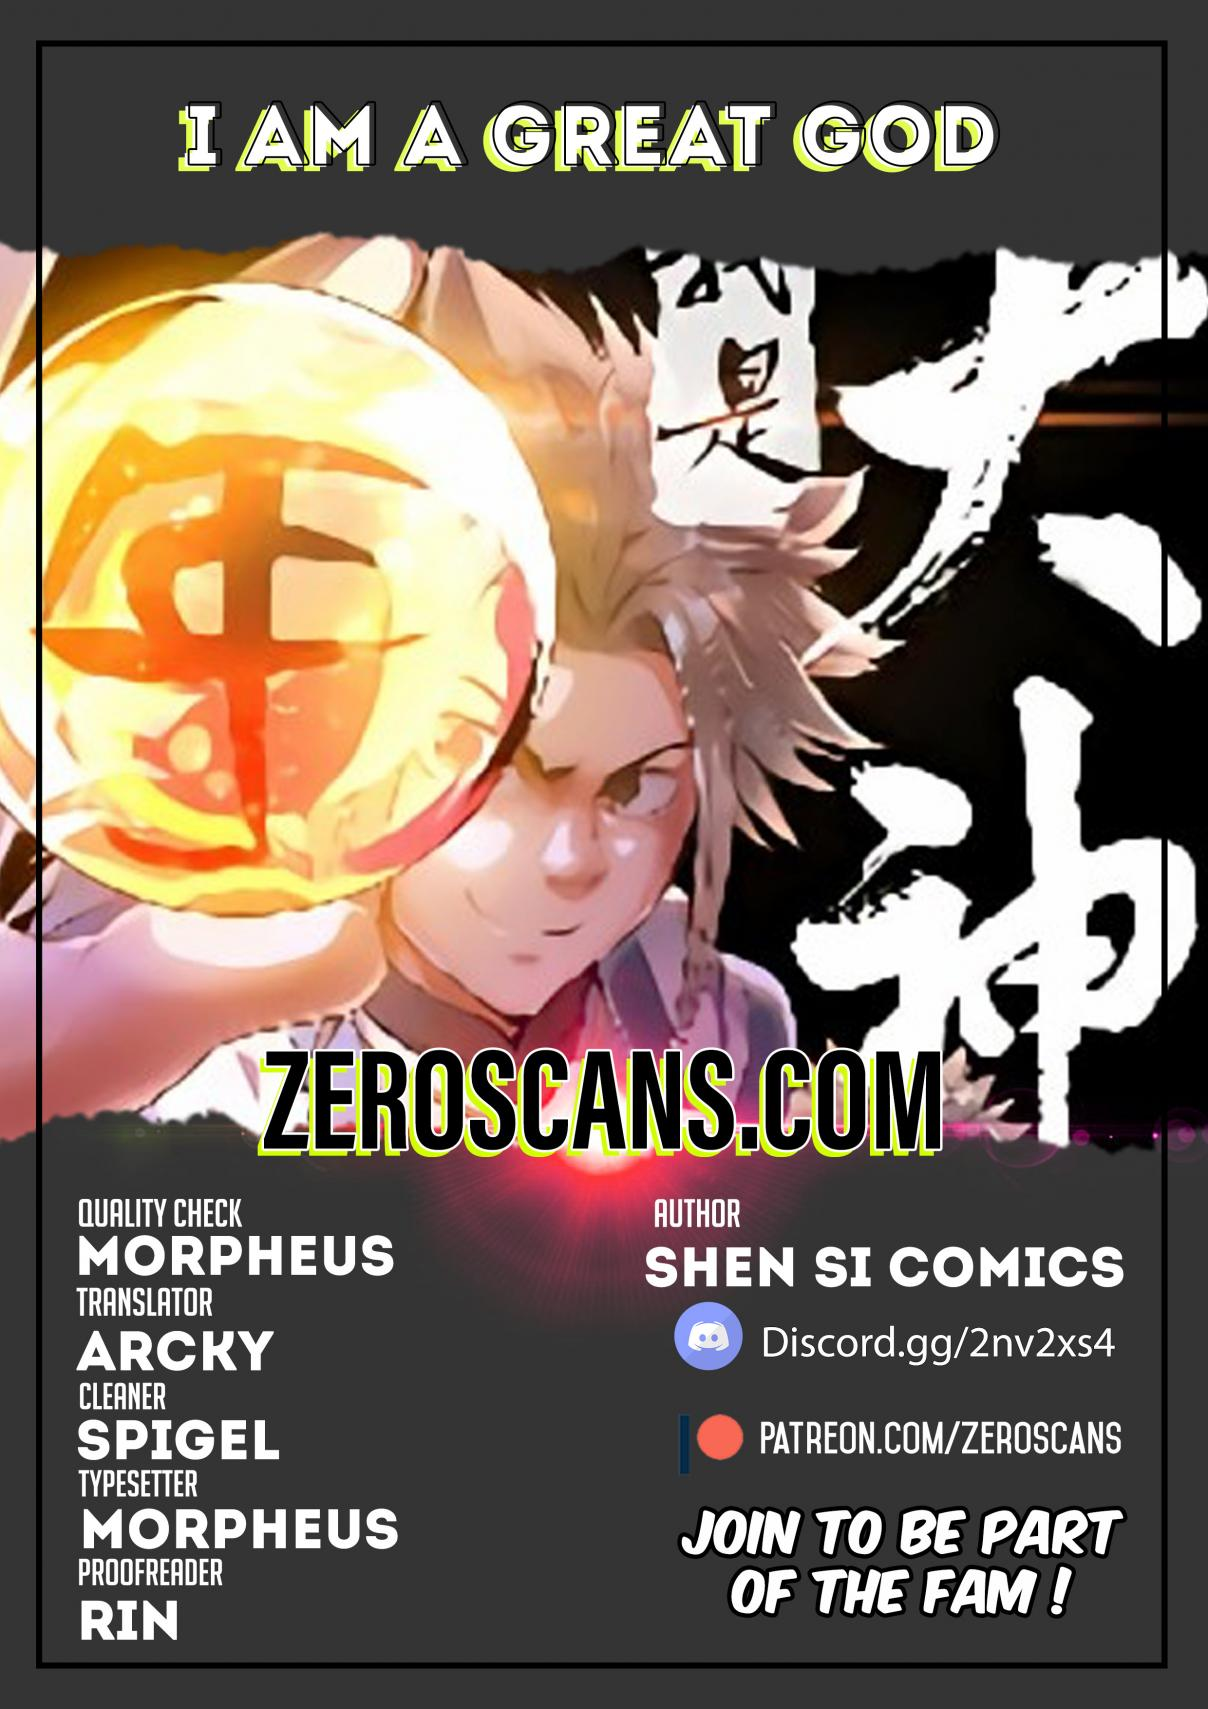 https://im.nineanime.com/comics/pic9/4/21124/491114/b2bbe583a6a8db7aacecdc3c3982b99e.jpg Page 1